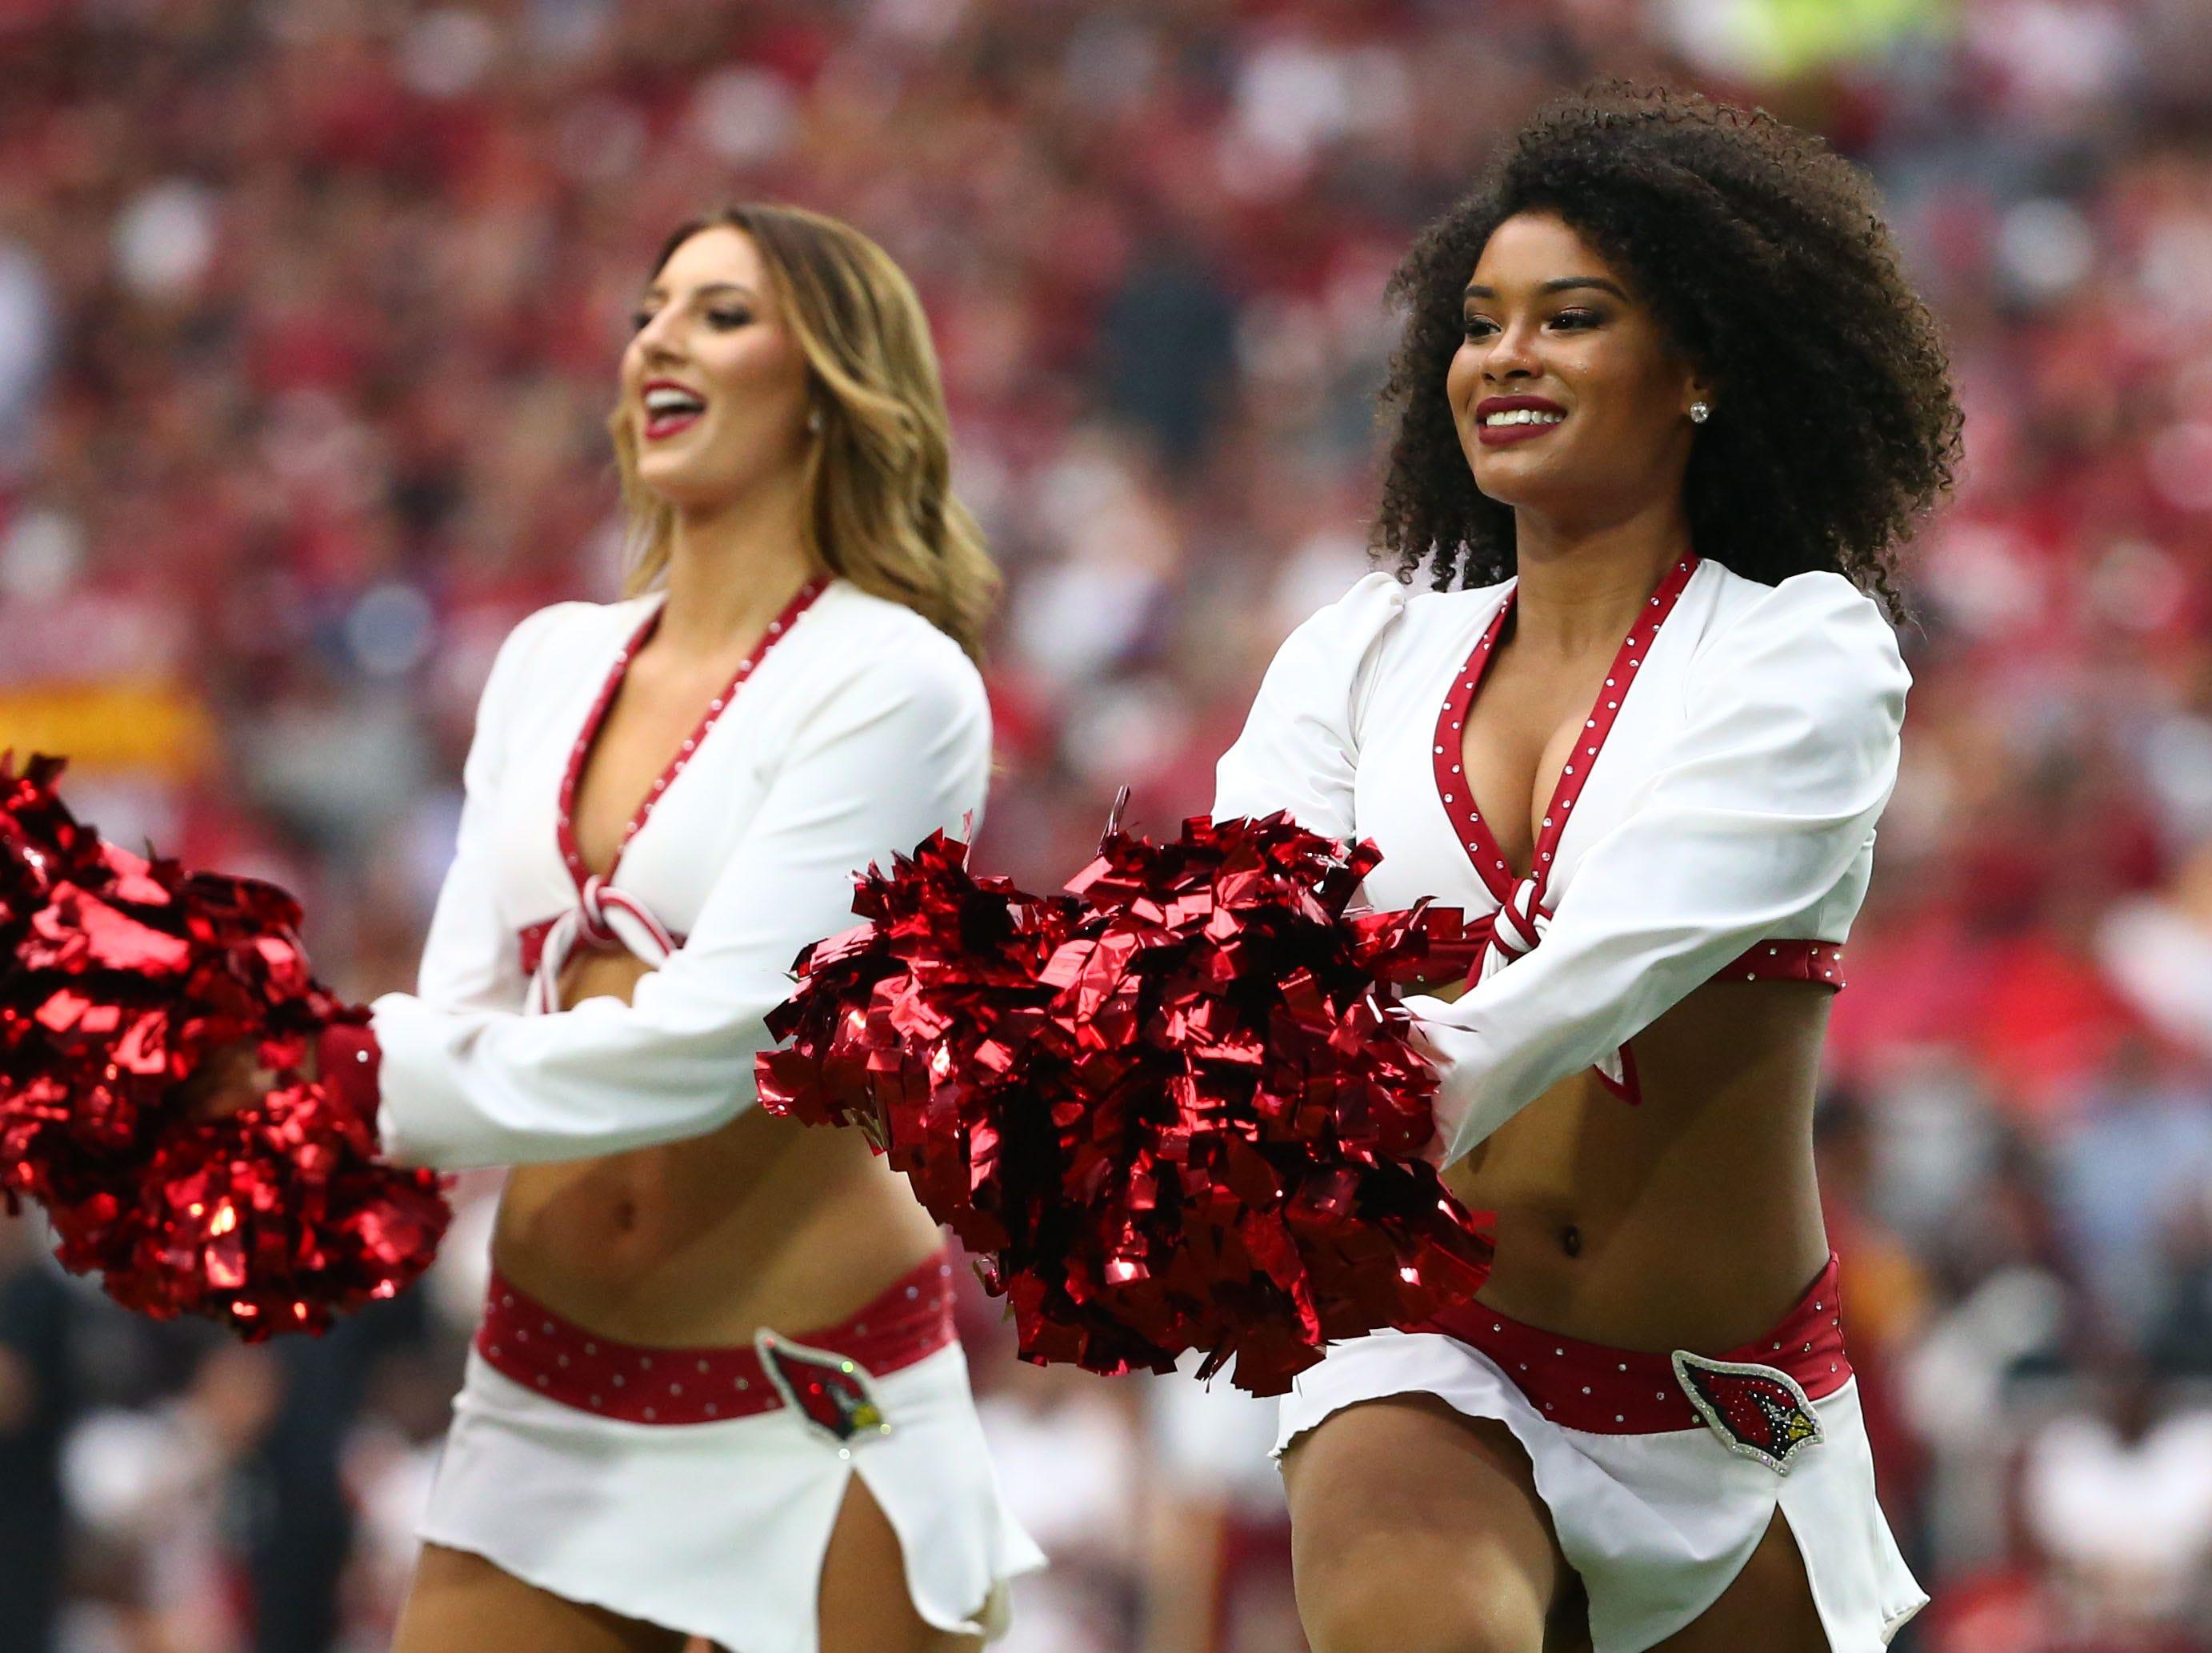 Arizona Cardinals cheerleaders perform in the second half at State Farm Stadium.